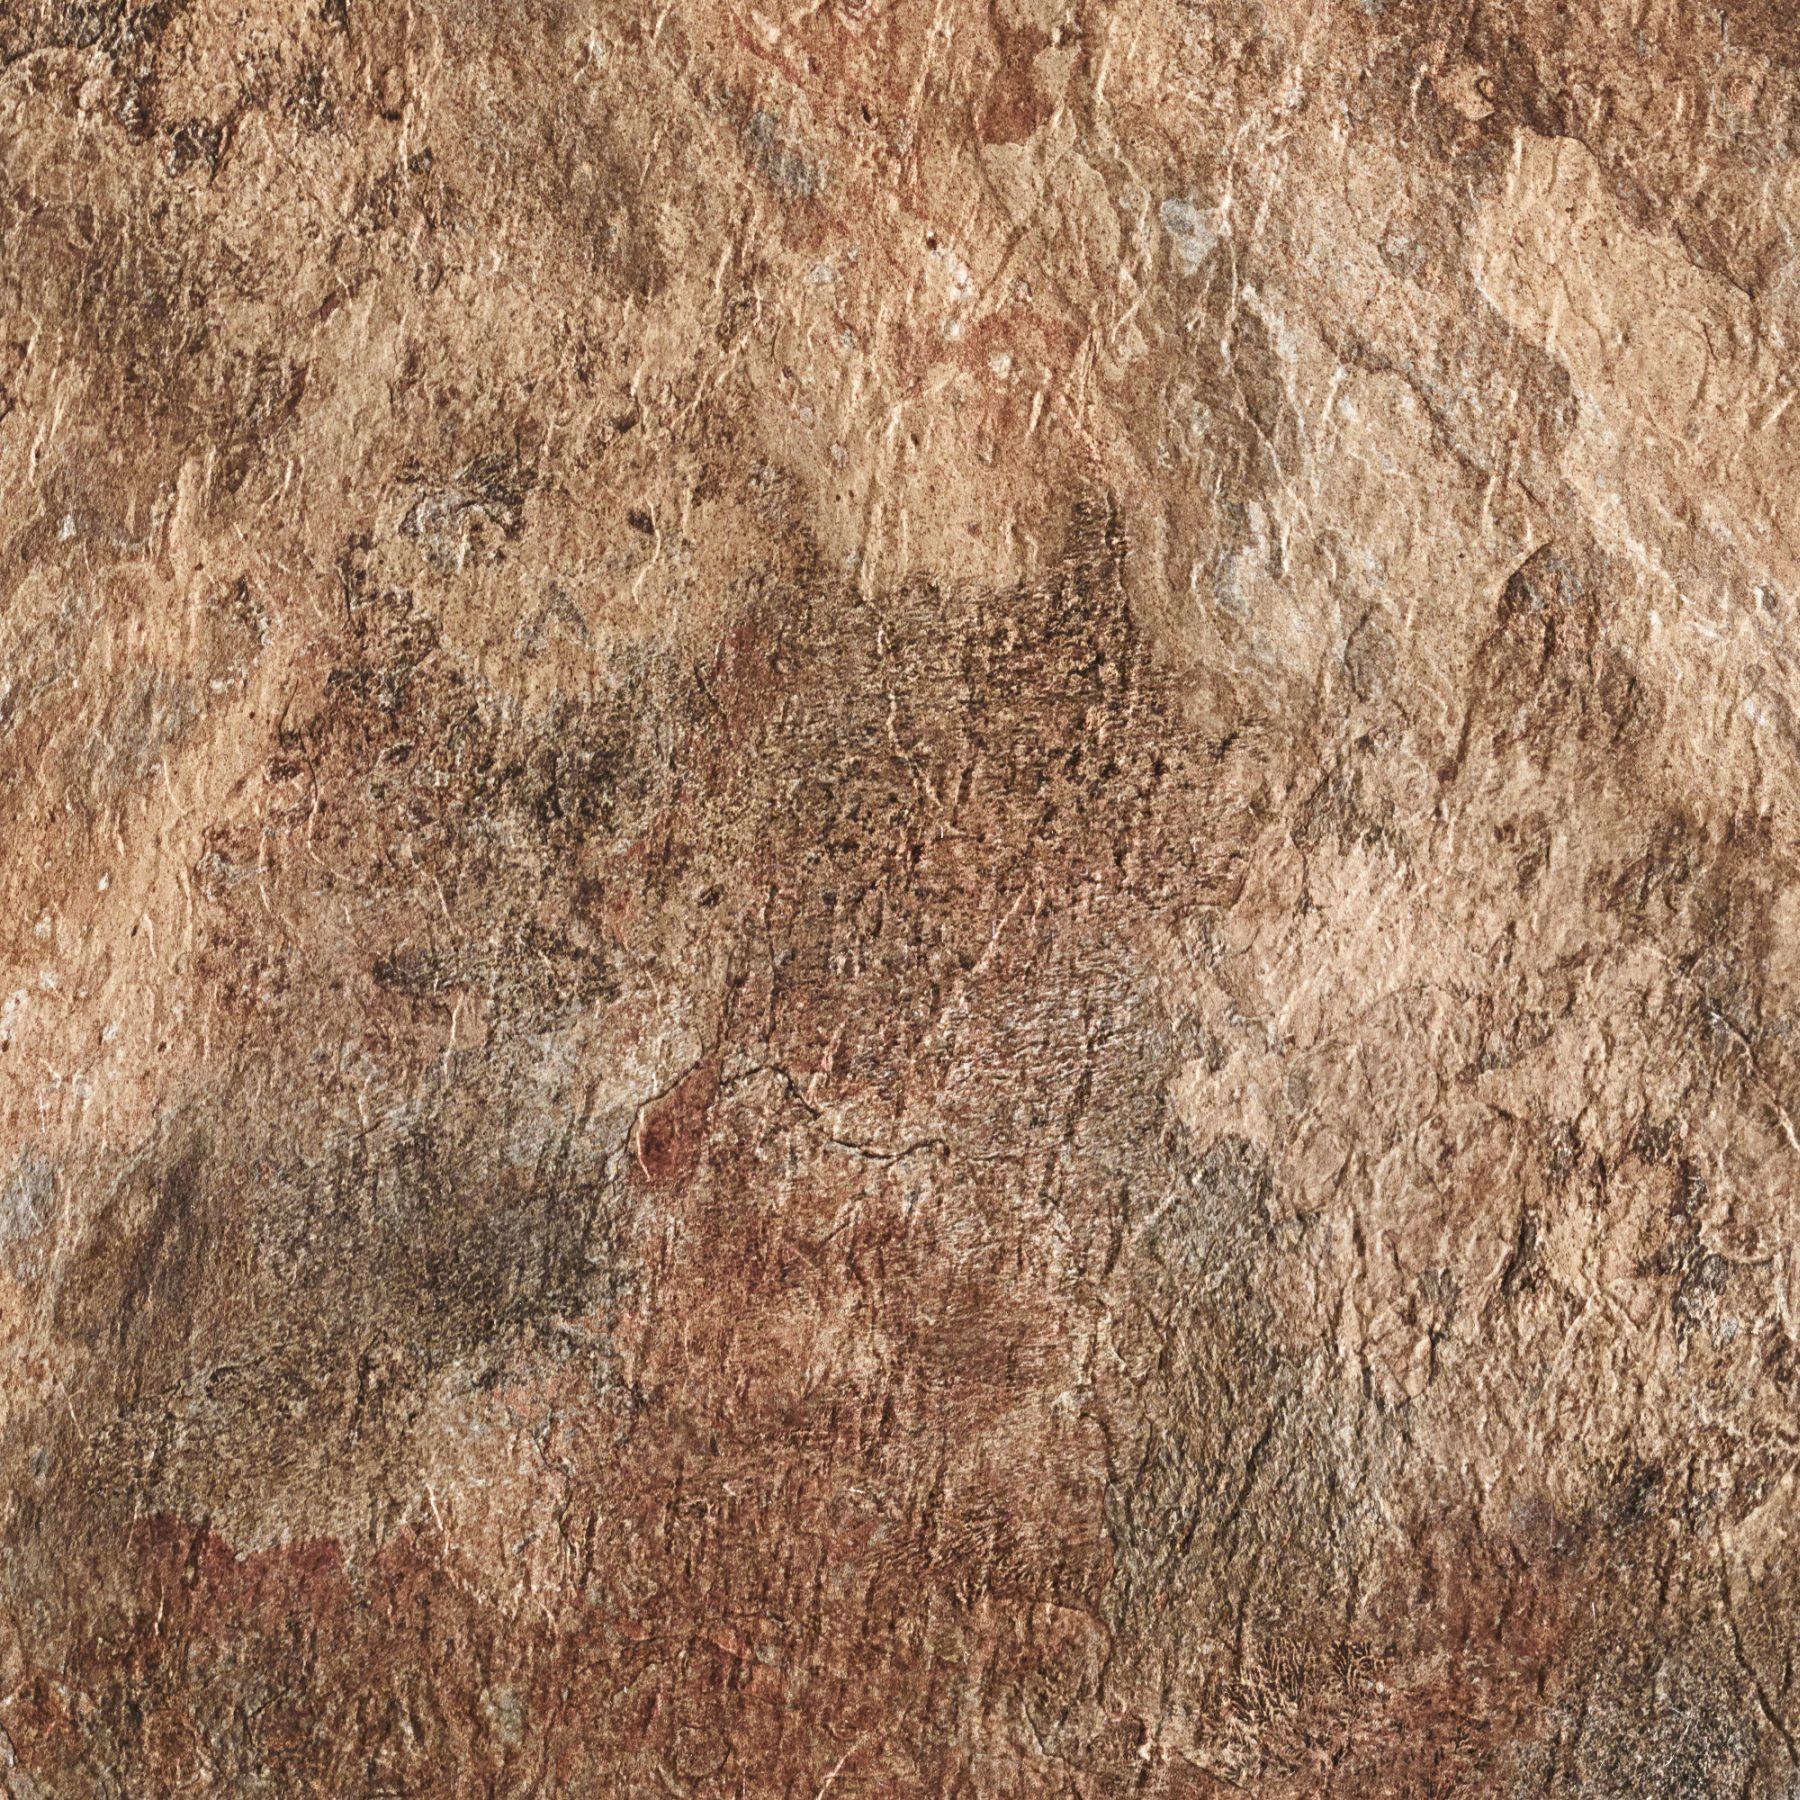 Rustic Slate Stone Self Stick Adhesive Vinyl Floor Tiles: Achim Majestic Rustic Copper Slate 18x18 Self Adhesive